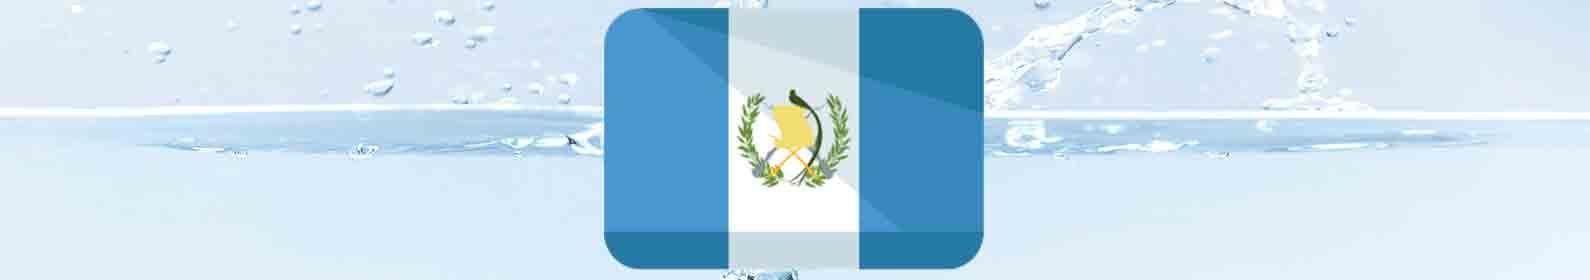 water-treatment-guatemala.jpg